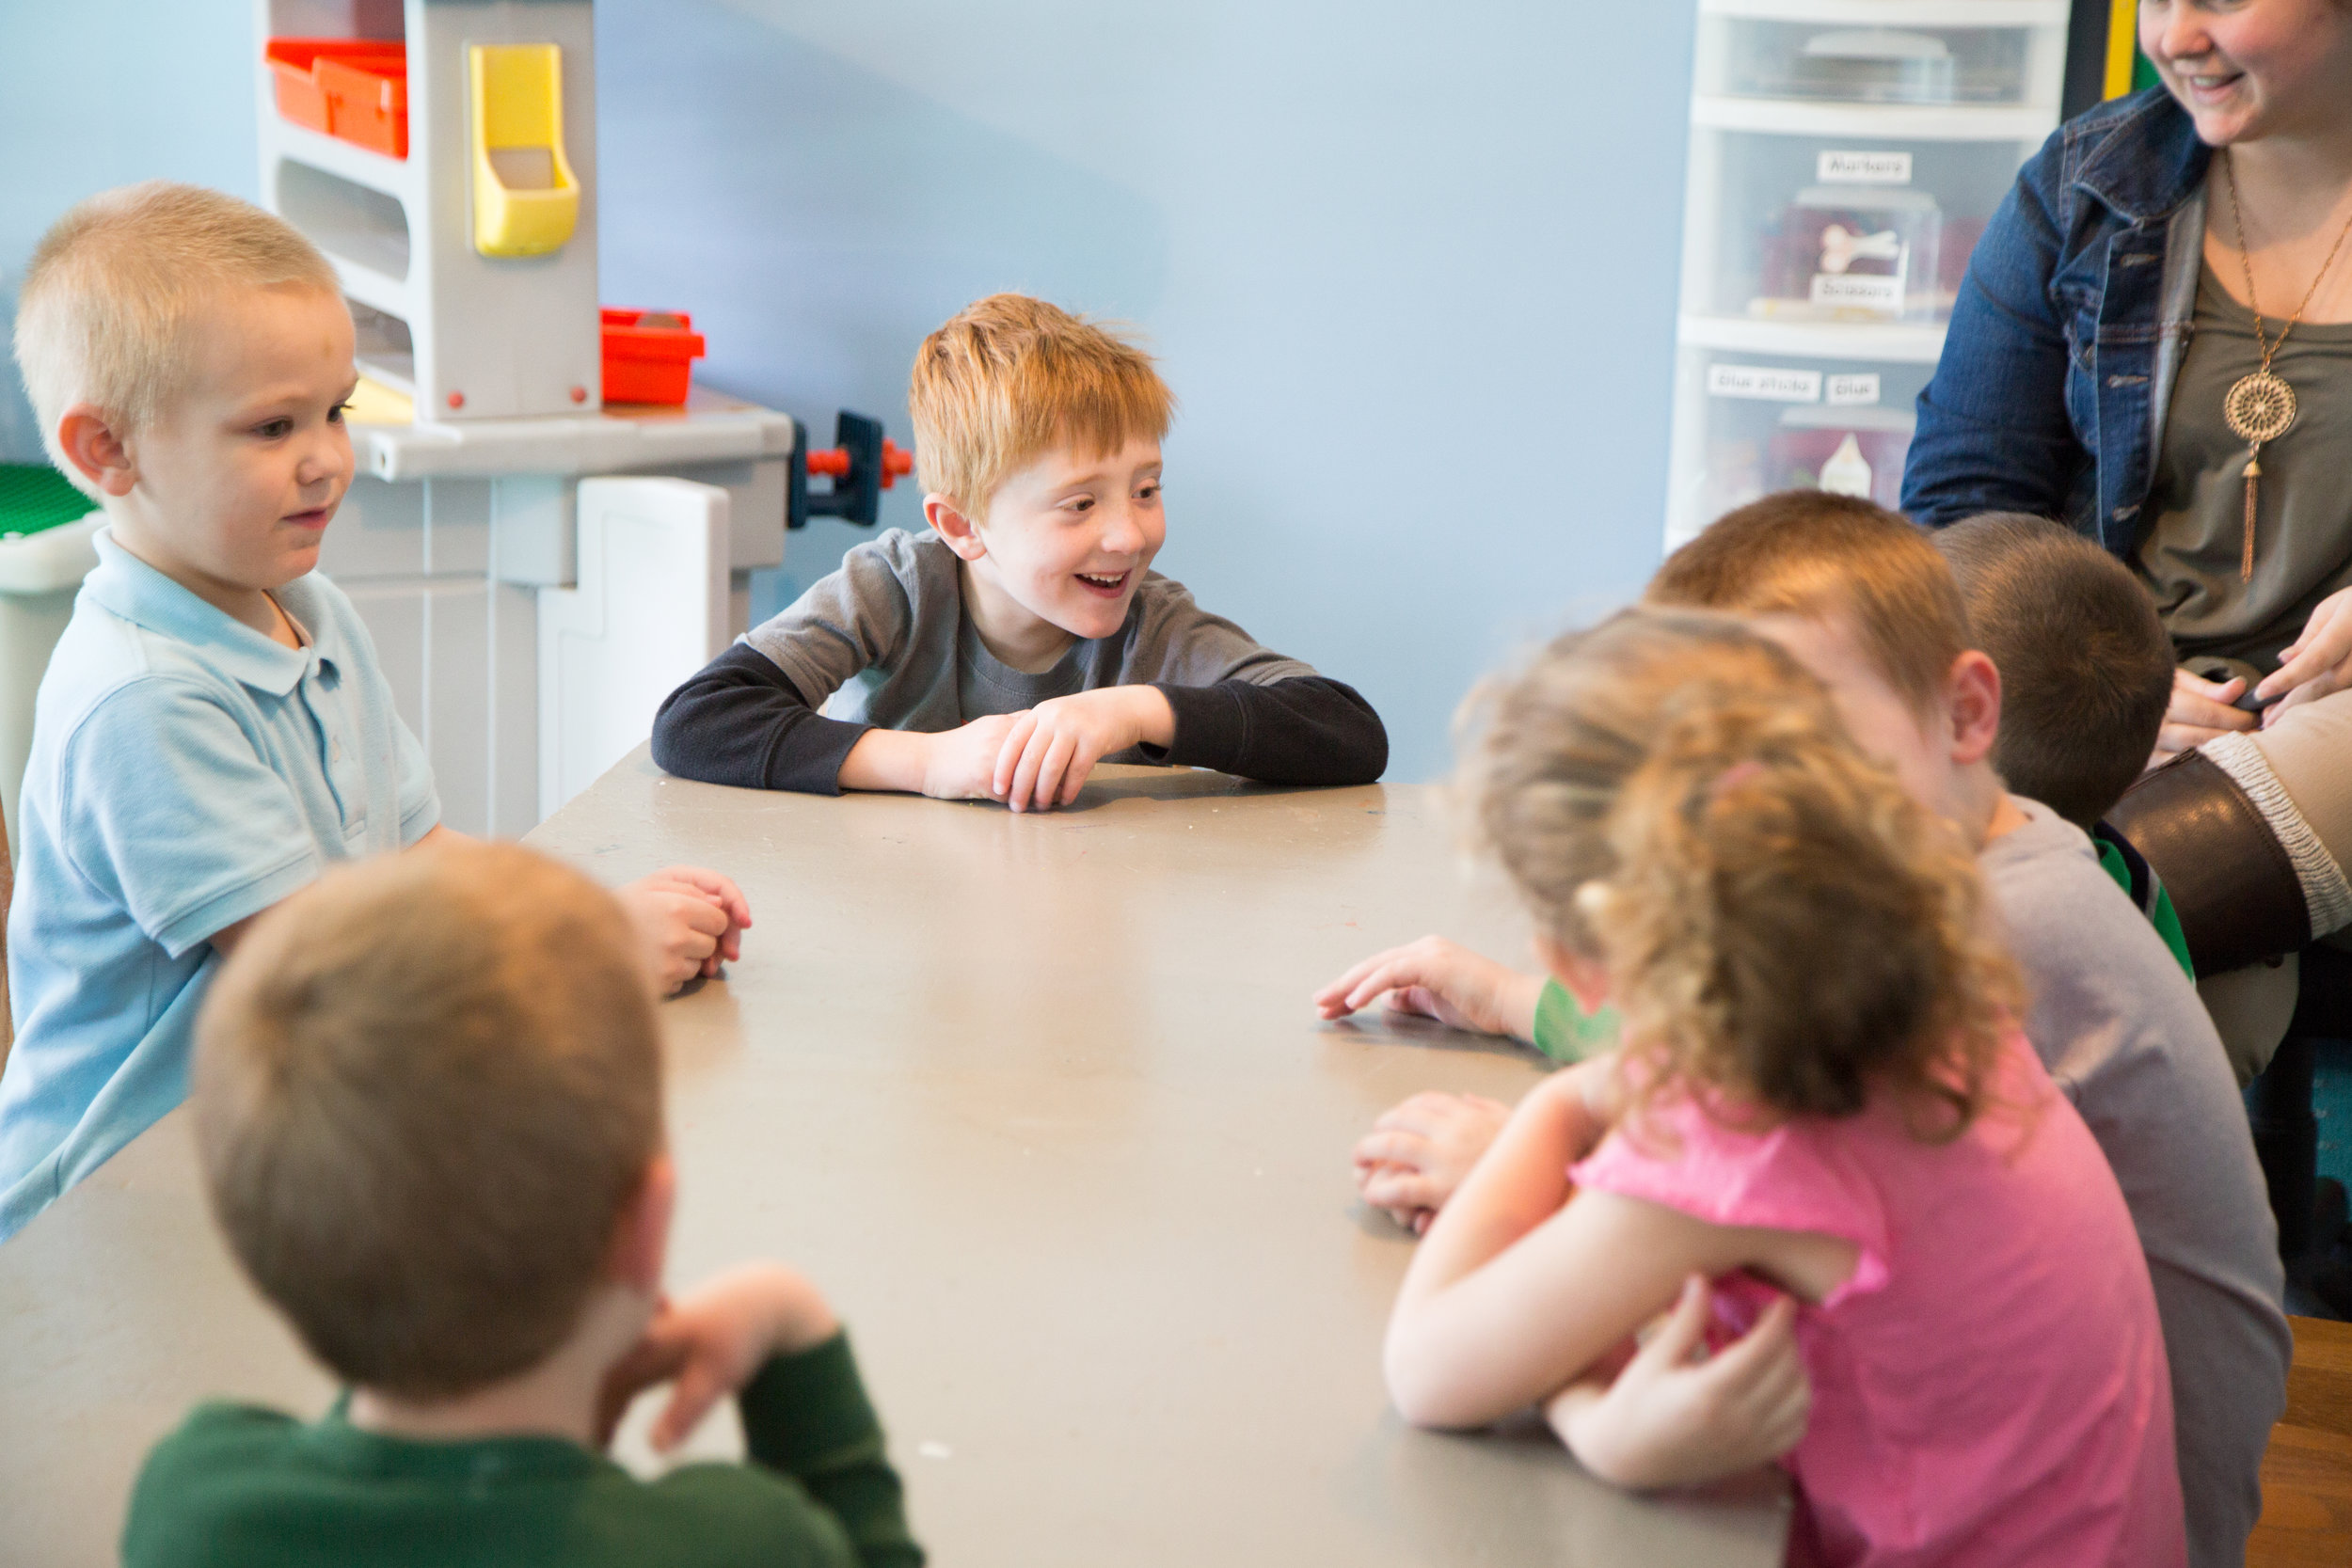 elementary age kids in class